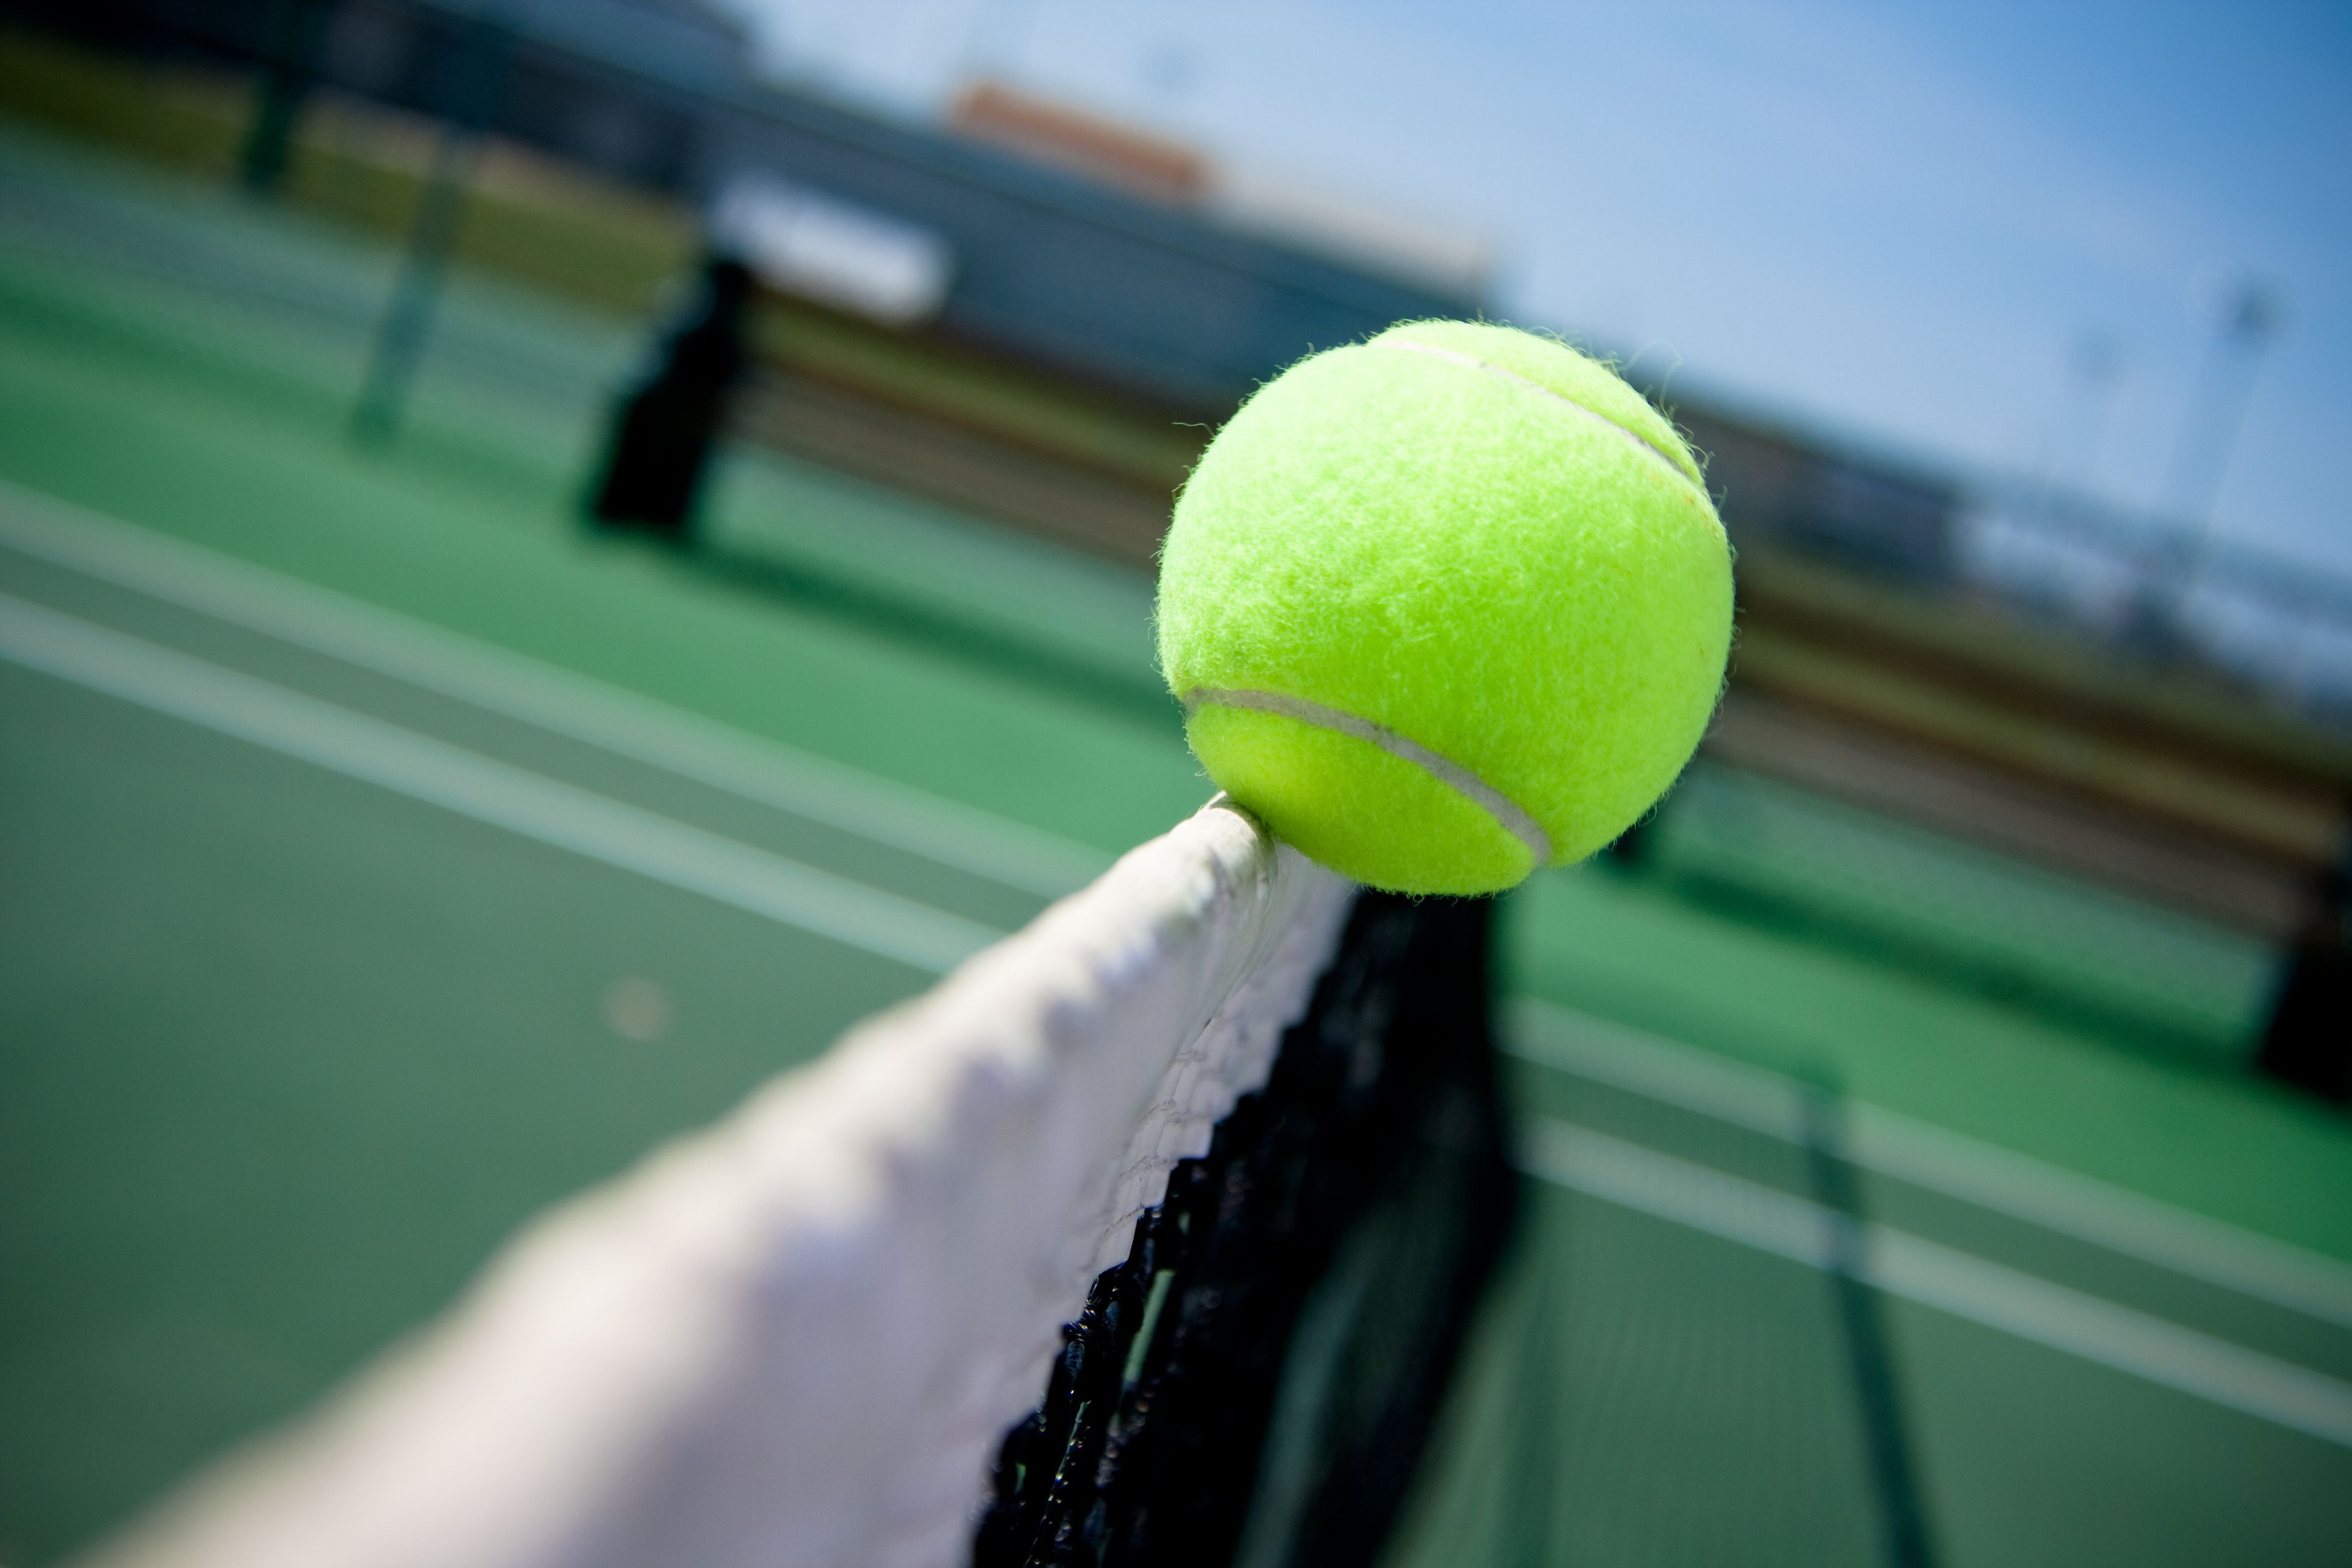 Top 10 Tennis Academies In Gurgaon I Tennis Classes In Gurgaon